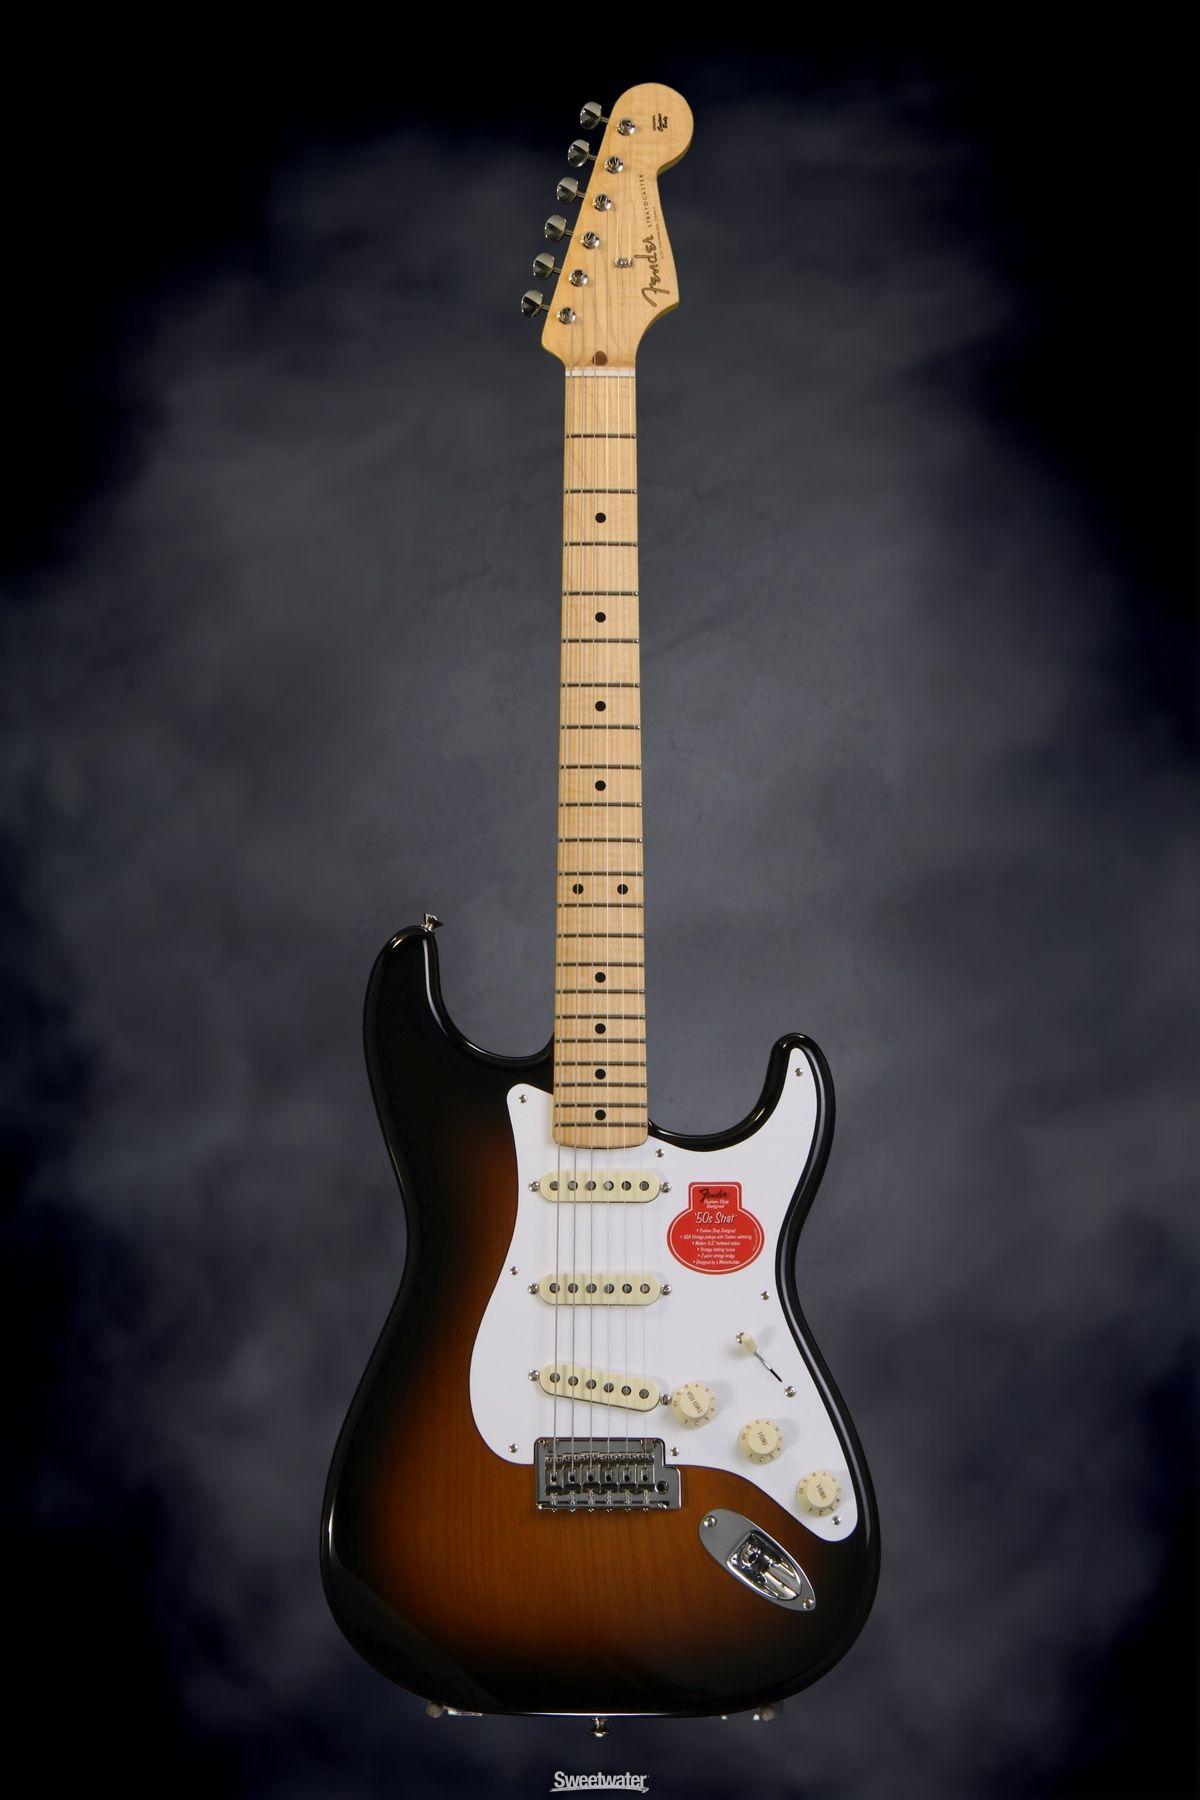 [SCHEMATICS_4FR]  Fender Vintera '50s Stratocaster Modified - 2-color Sunburst   Fender  american standard, Fender custom shop, Fender vintage   Fender Classic Player 50s Stratocaster Wiring Diagram      Pinterest